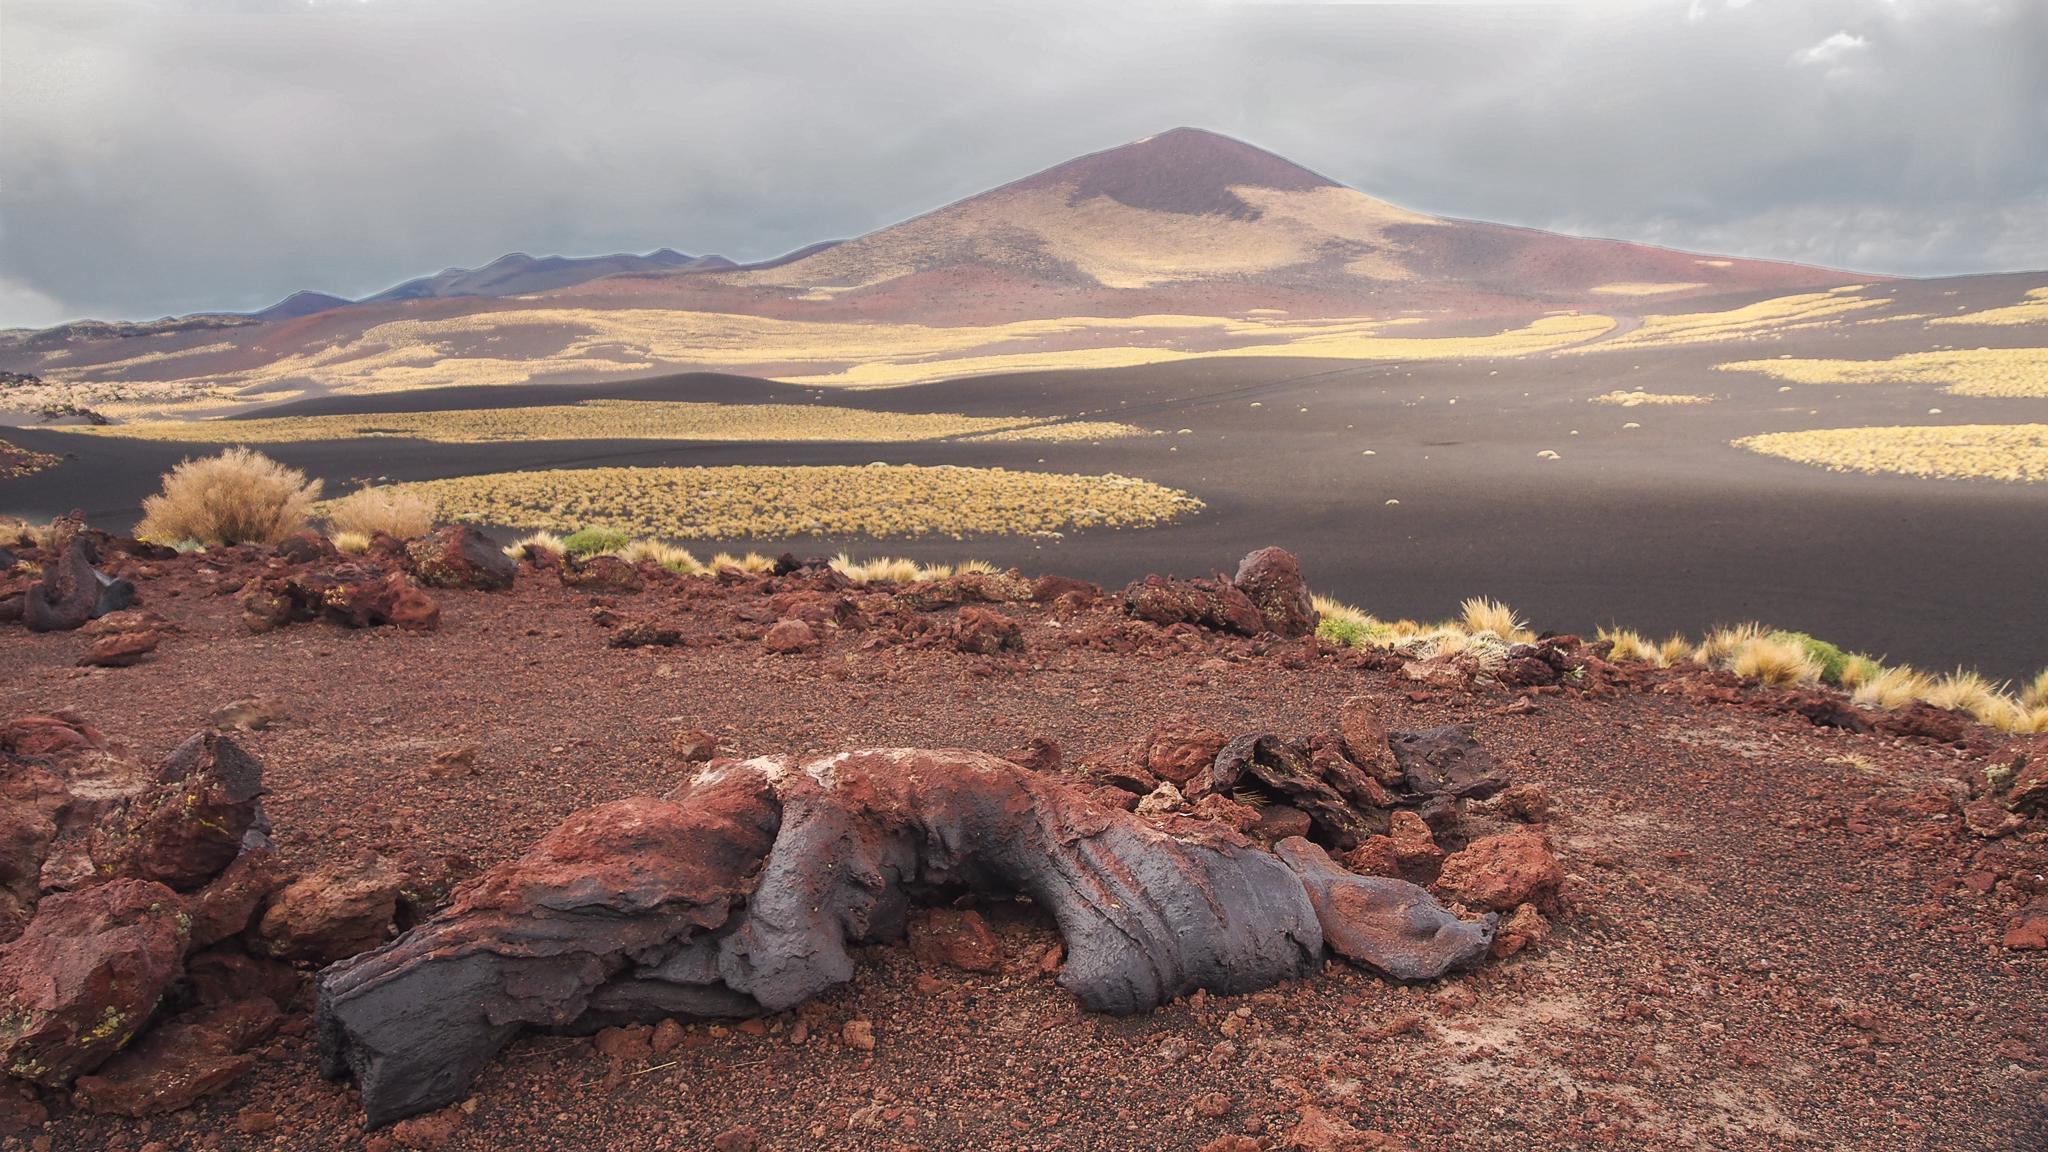 payunia lava fields, Argentina